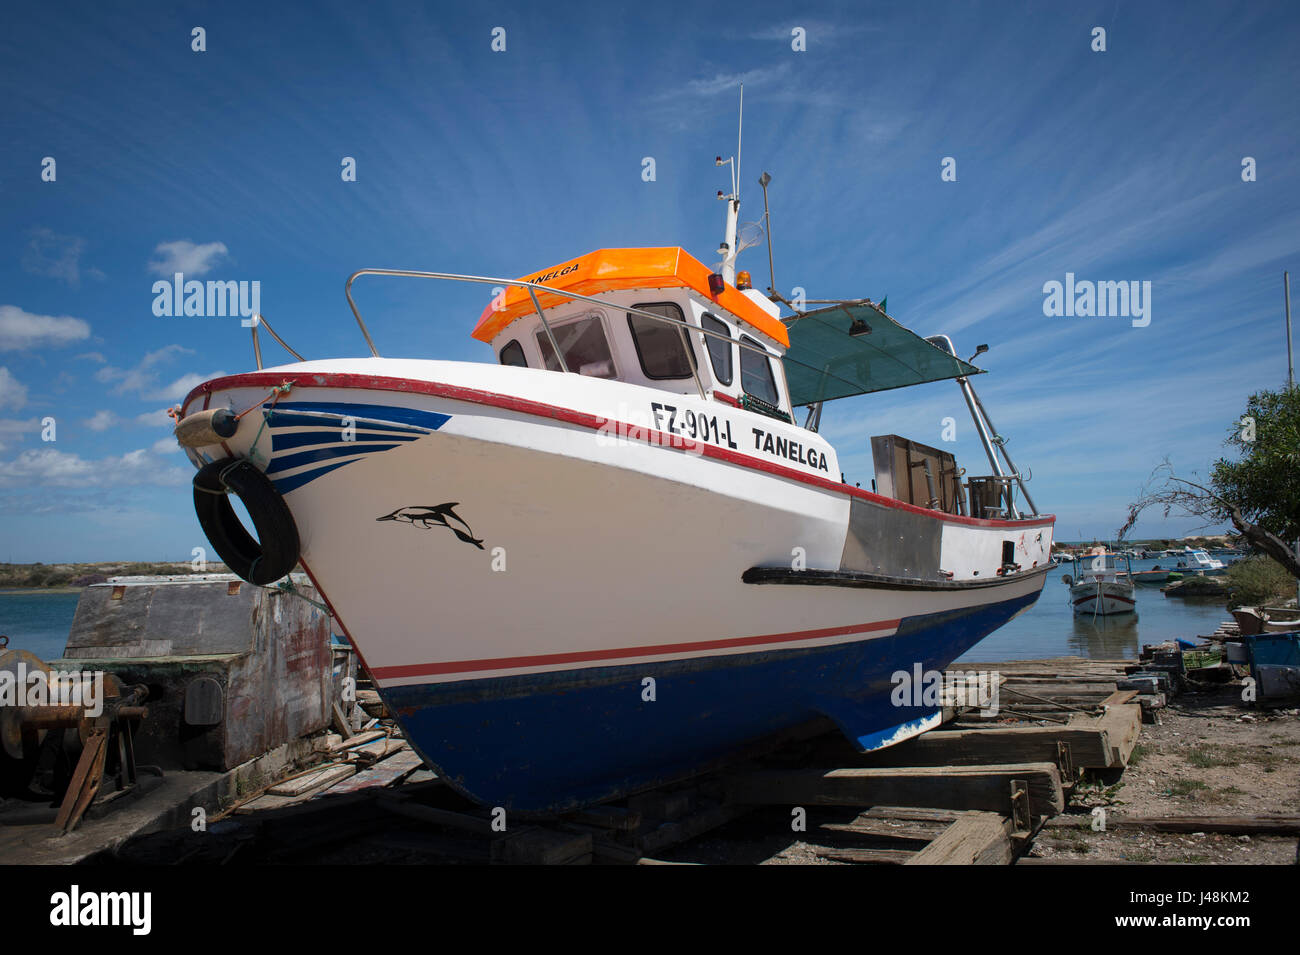 Fishing boat in Fuseta Portugal, ashore, dry dock. - Stock Image